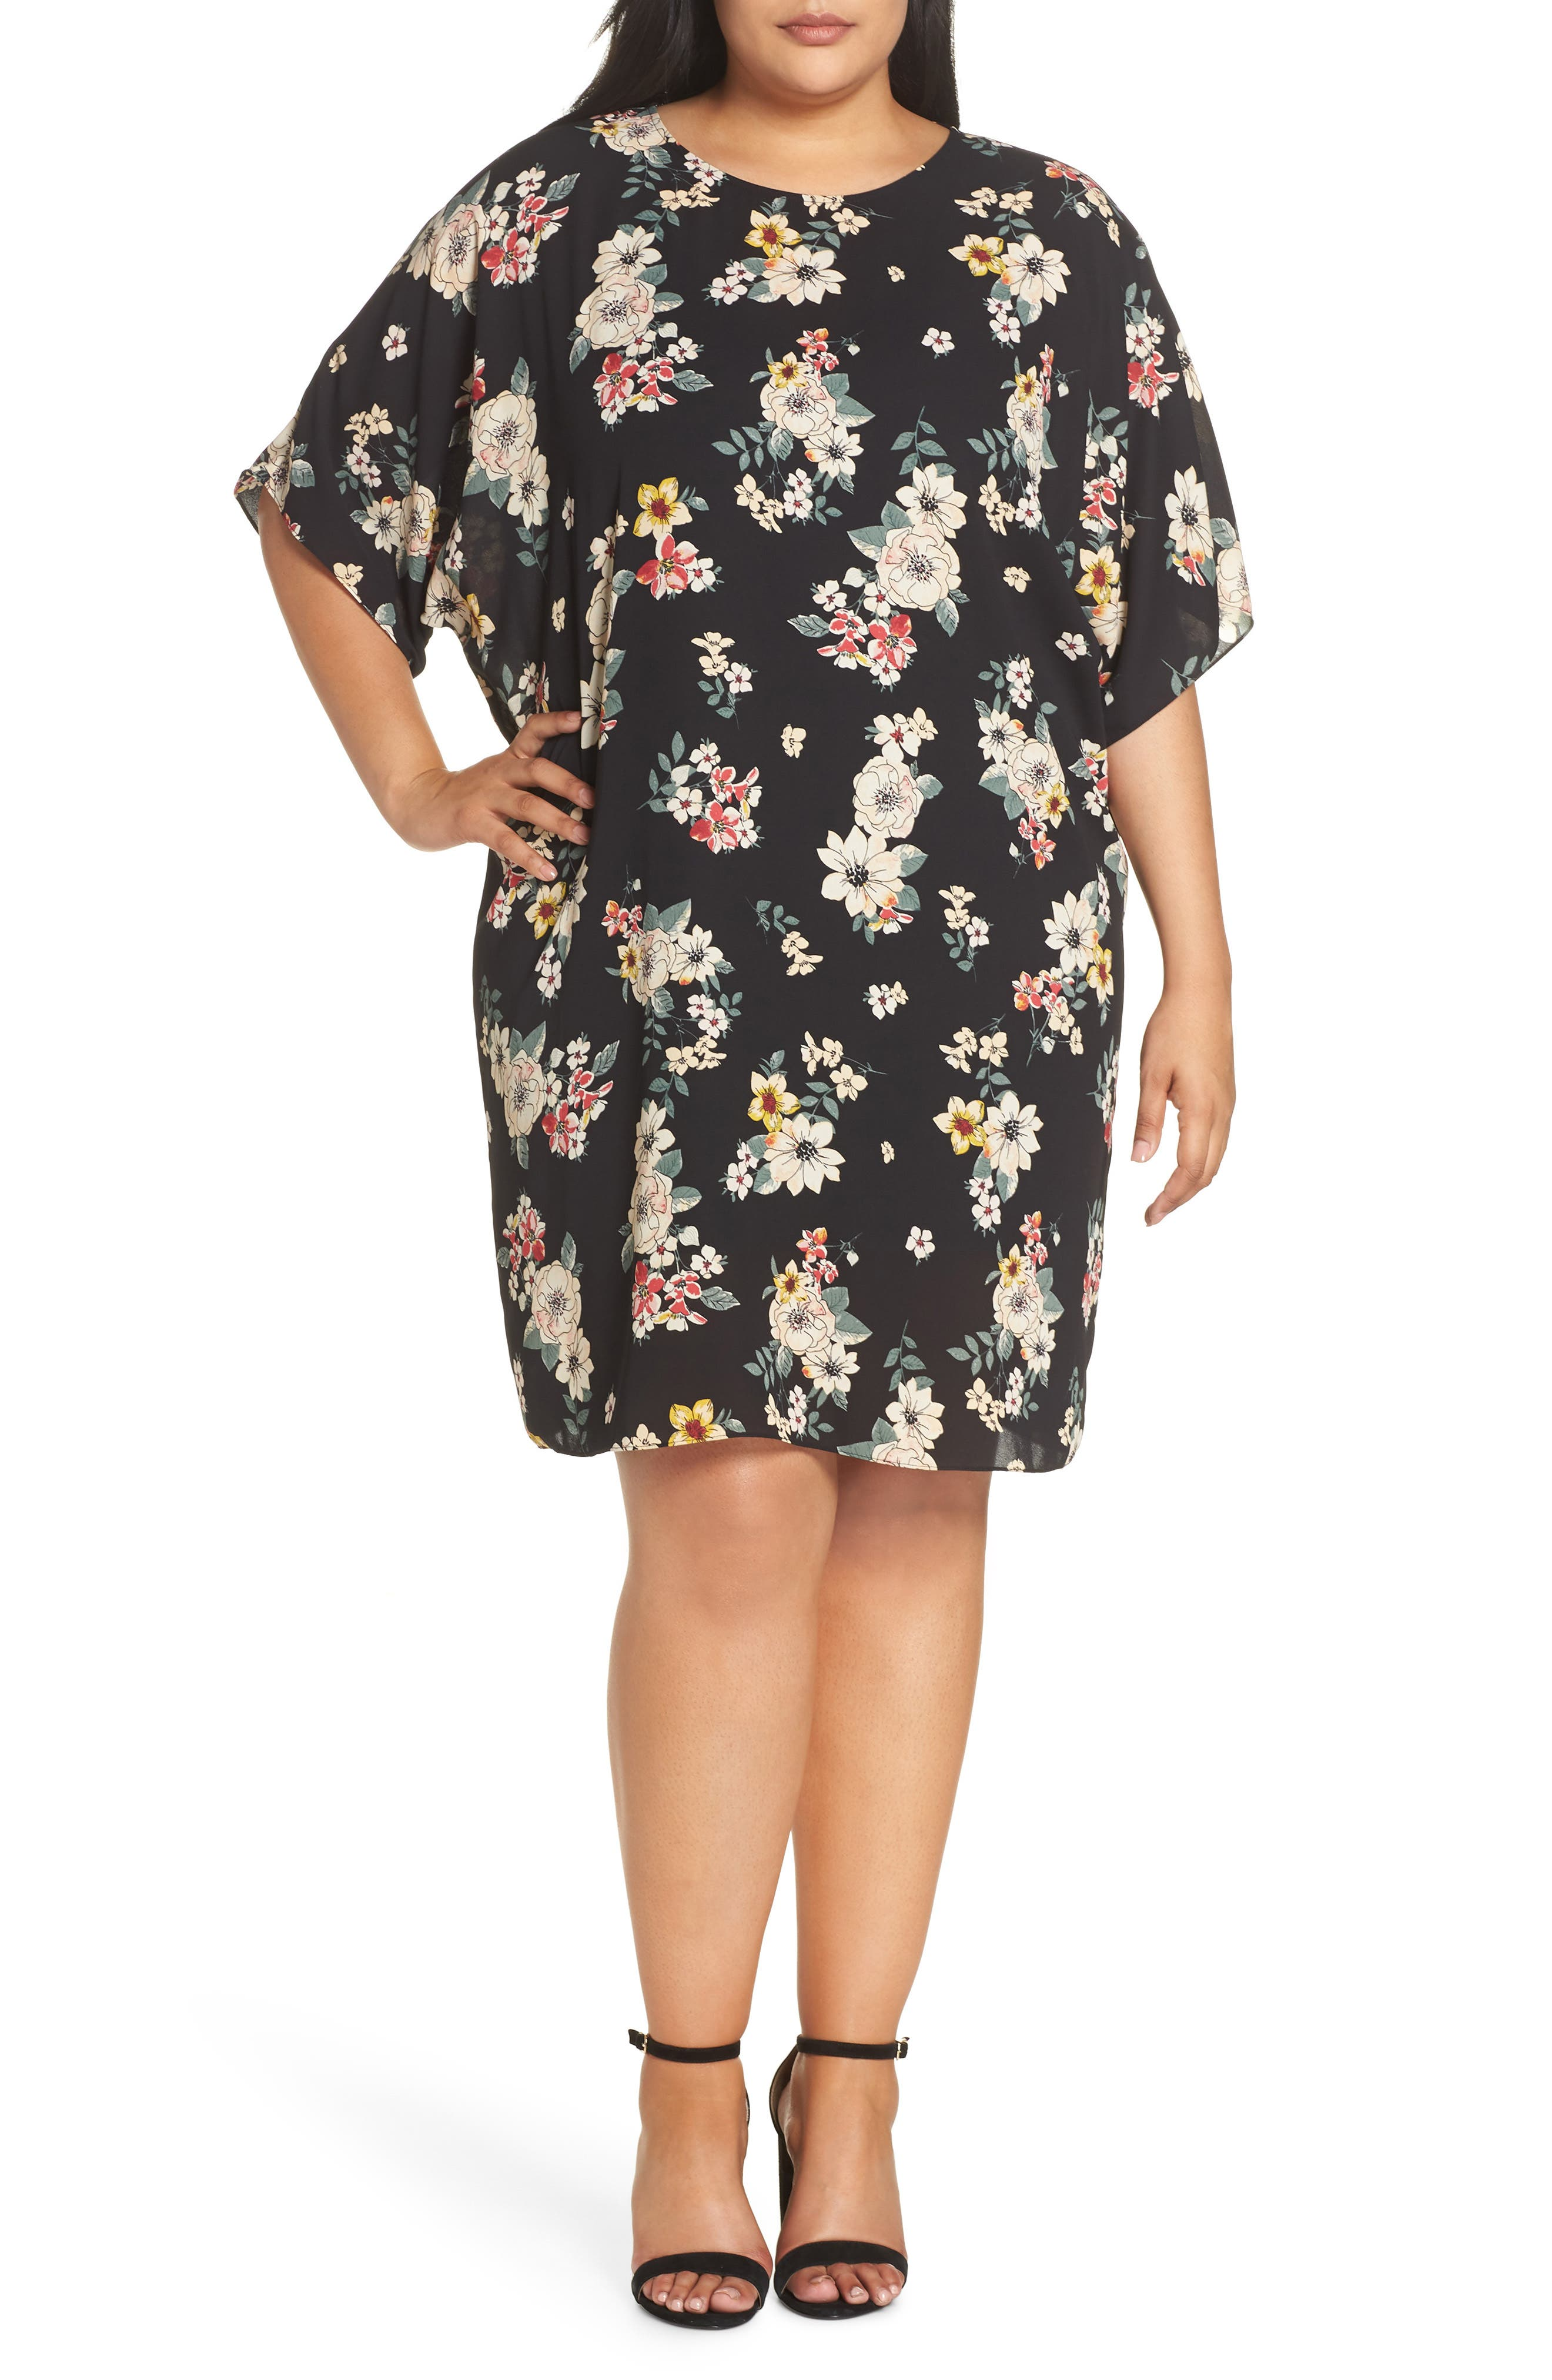 Plus Size Vince Camuto Floral Story Dolman Sleeve Dress, Black